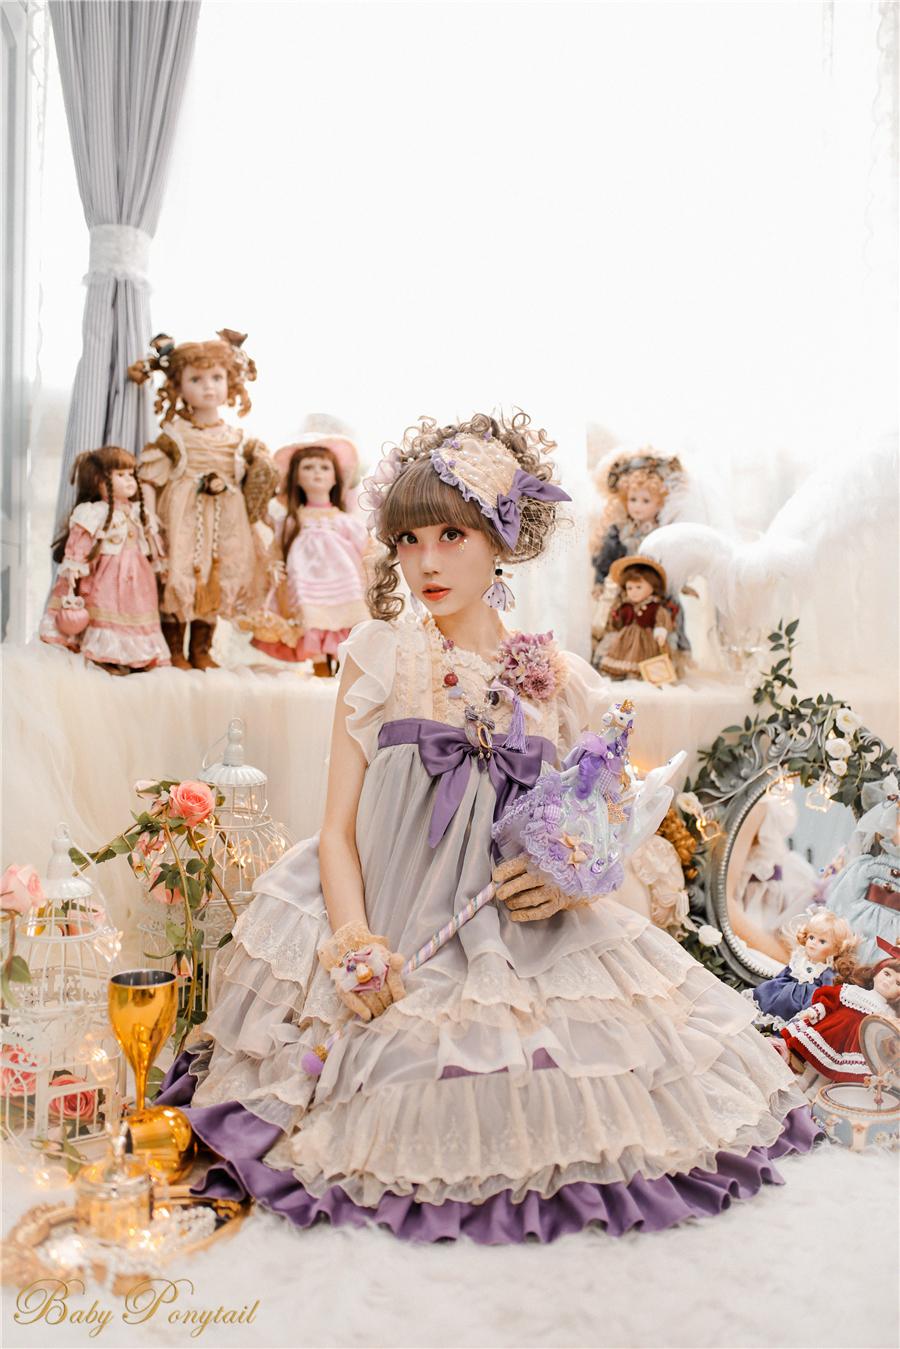 Babyponytail_Model Photo_Present Angel_JSK Violet_2_Kaka_08.jpg